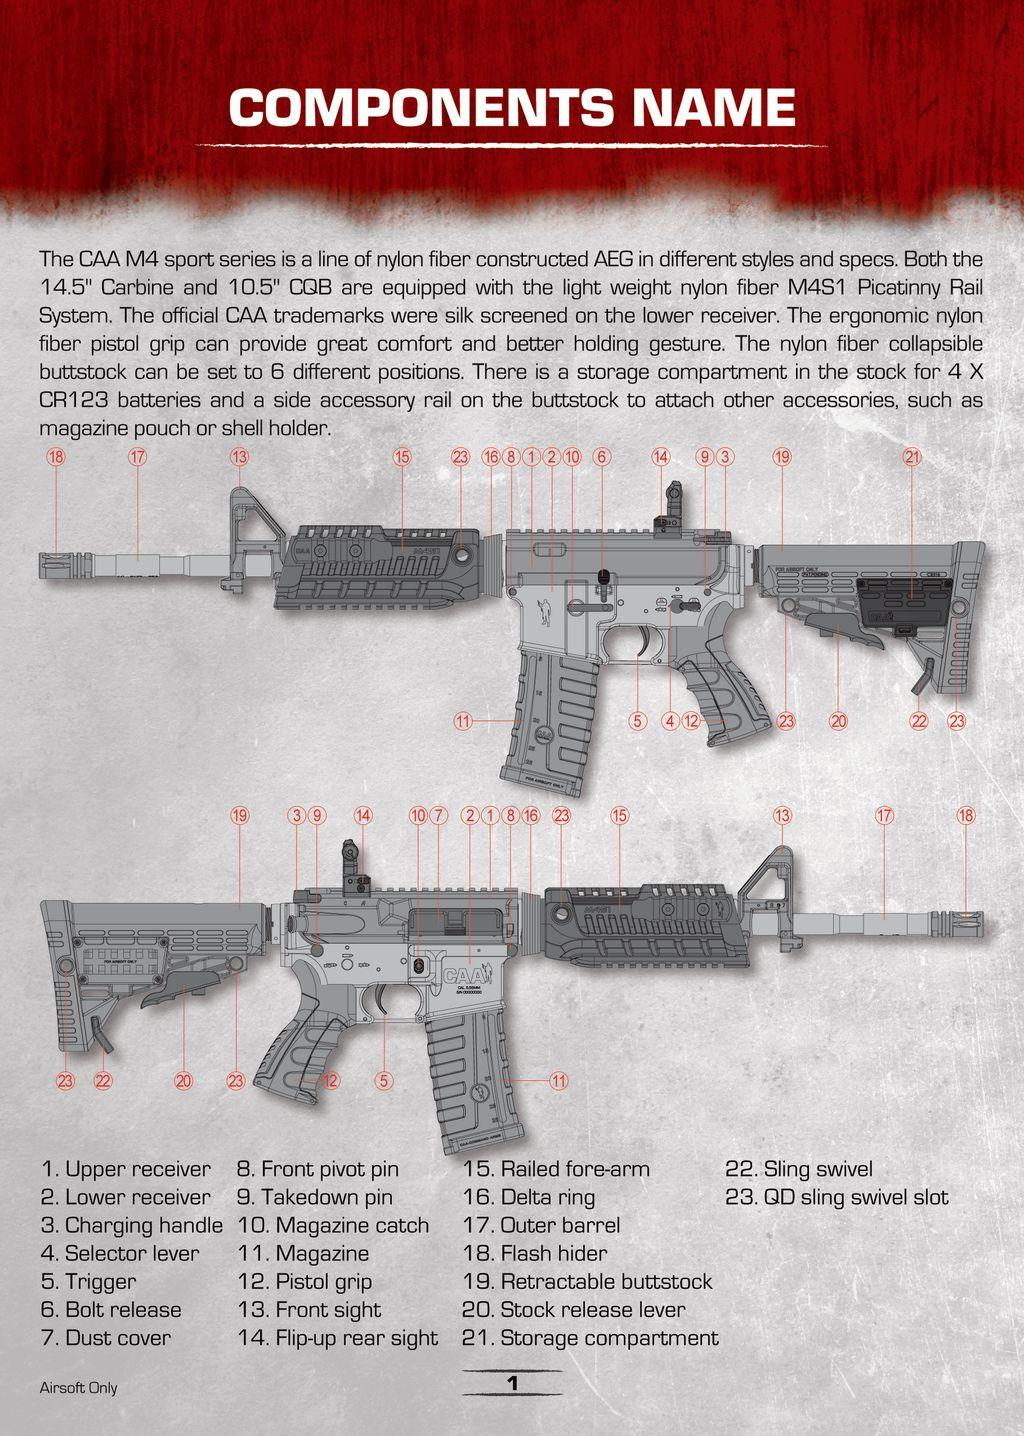 M4 Sportseries Manual P4.jpg